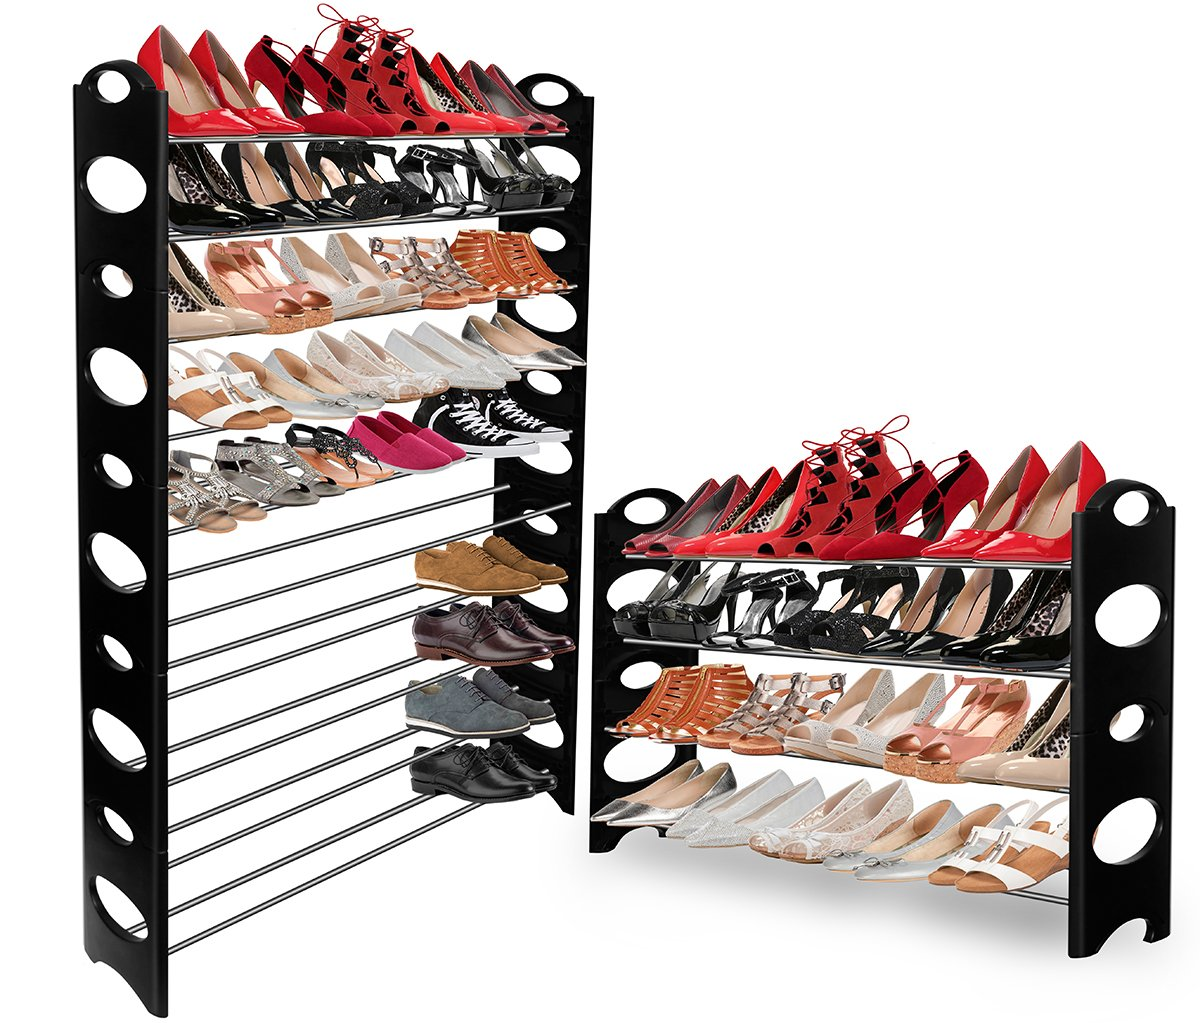 OxGord 50 Pair Shoe Rack Storage Organizer, 10 Tier Portable Wardrobe Closet  Bench Tower Stackable, Adjustable Shelf   Strong